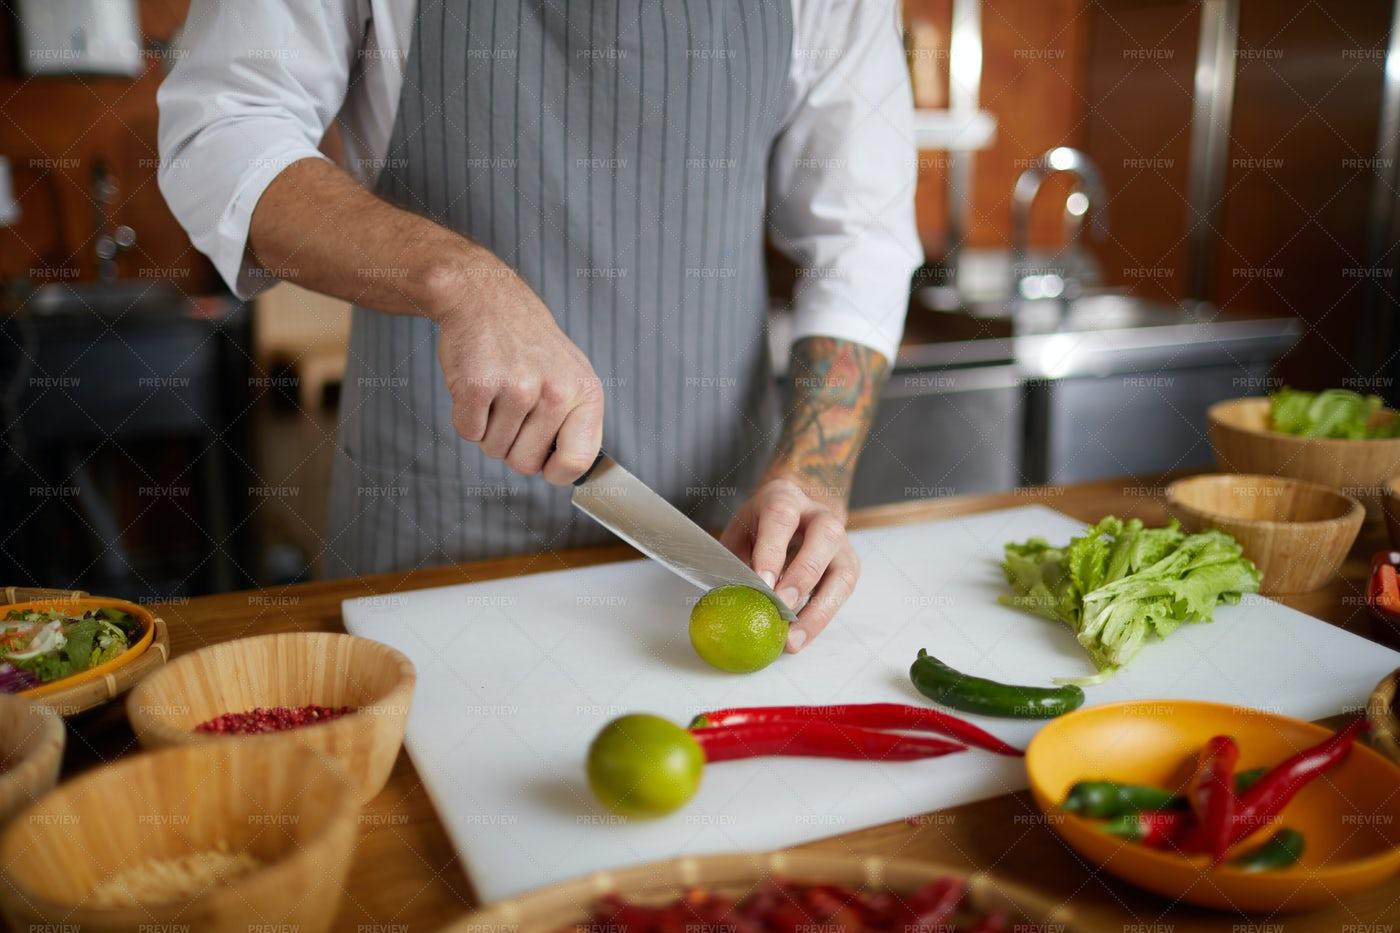 Chef Cutting Citrus In Kitchen: Stock Photos